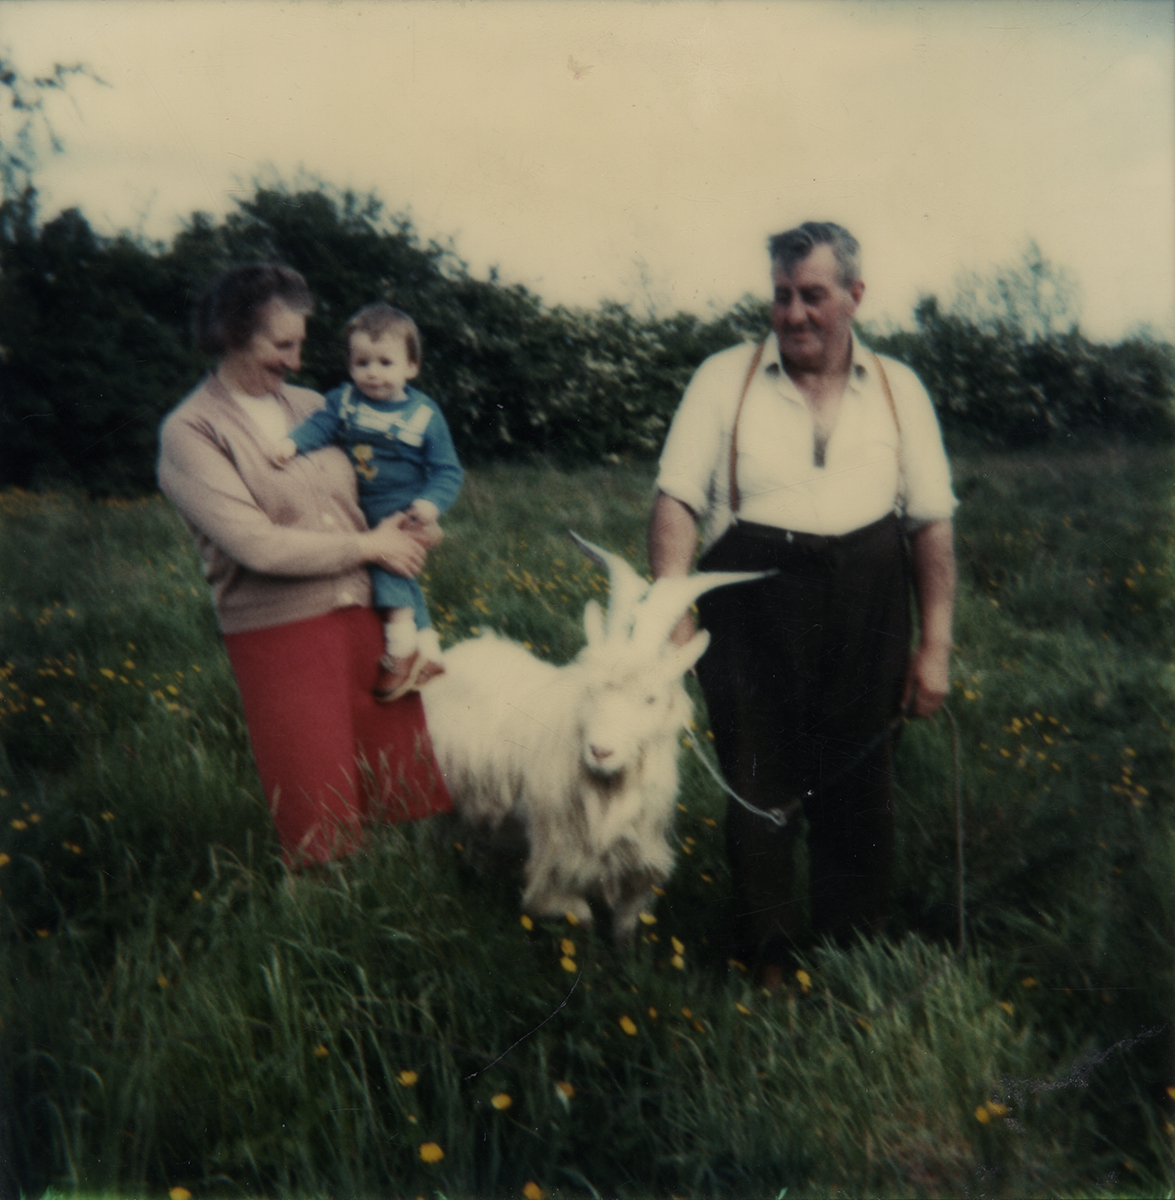 McKeown // County Antrim :: Margaret and George McKeown with their goat in their front garden